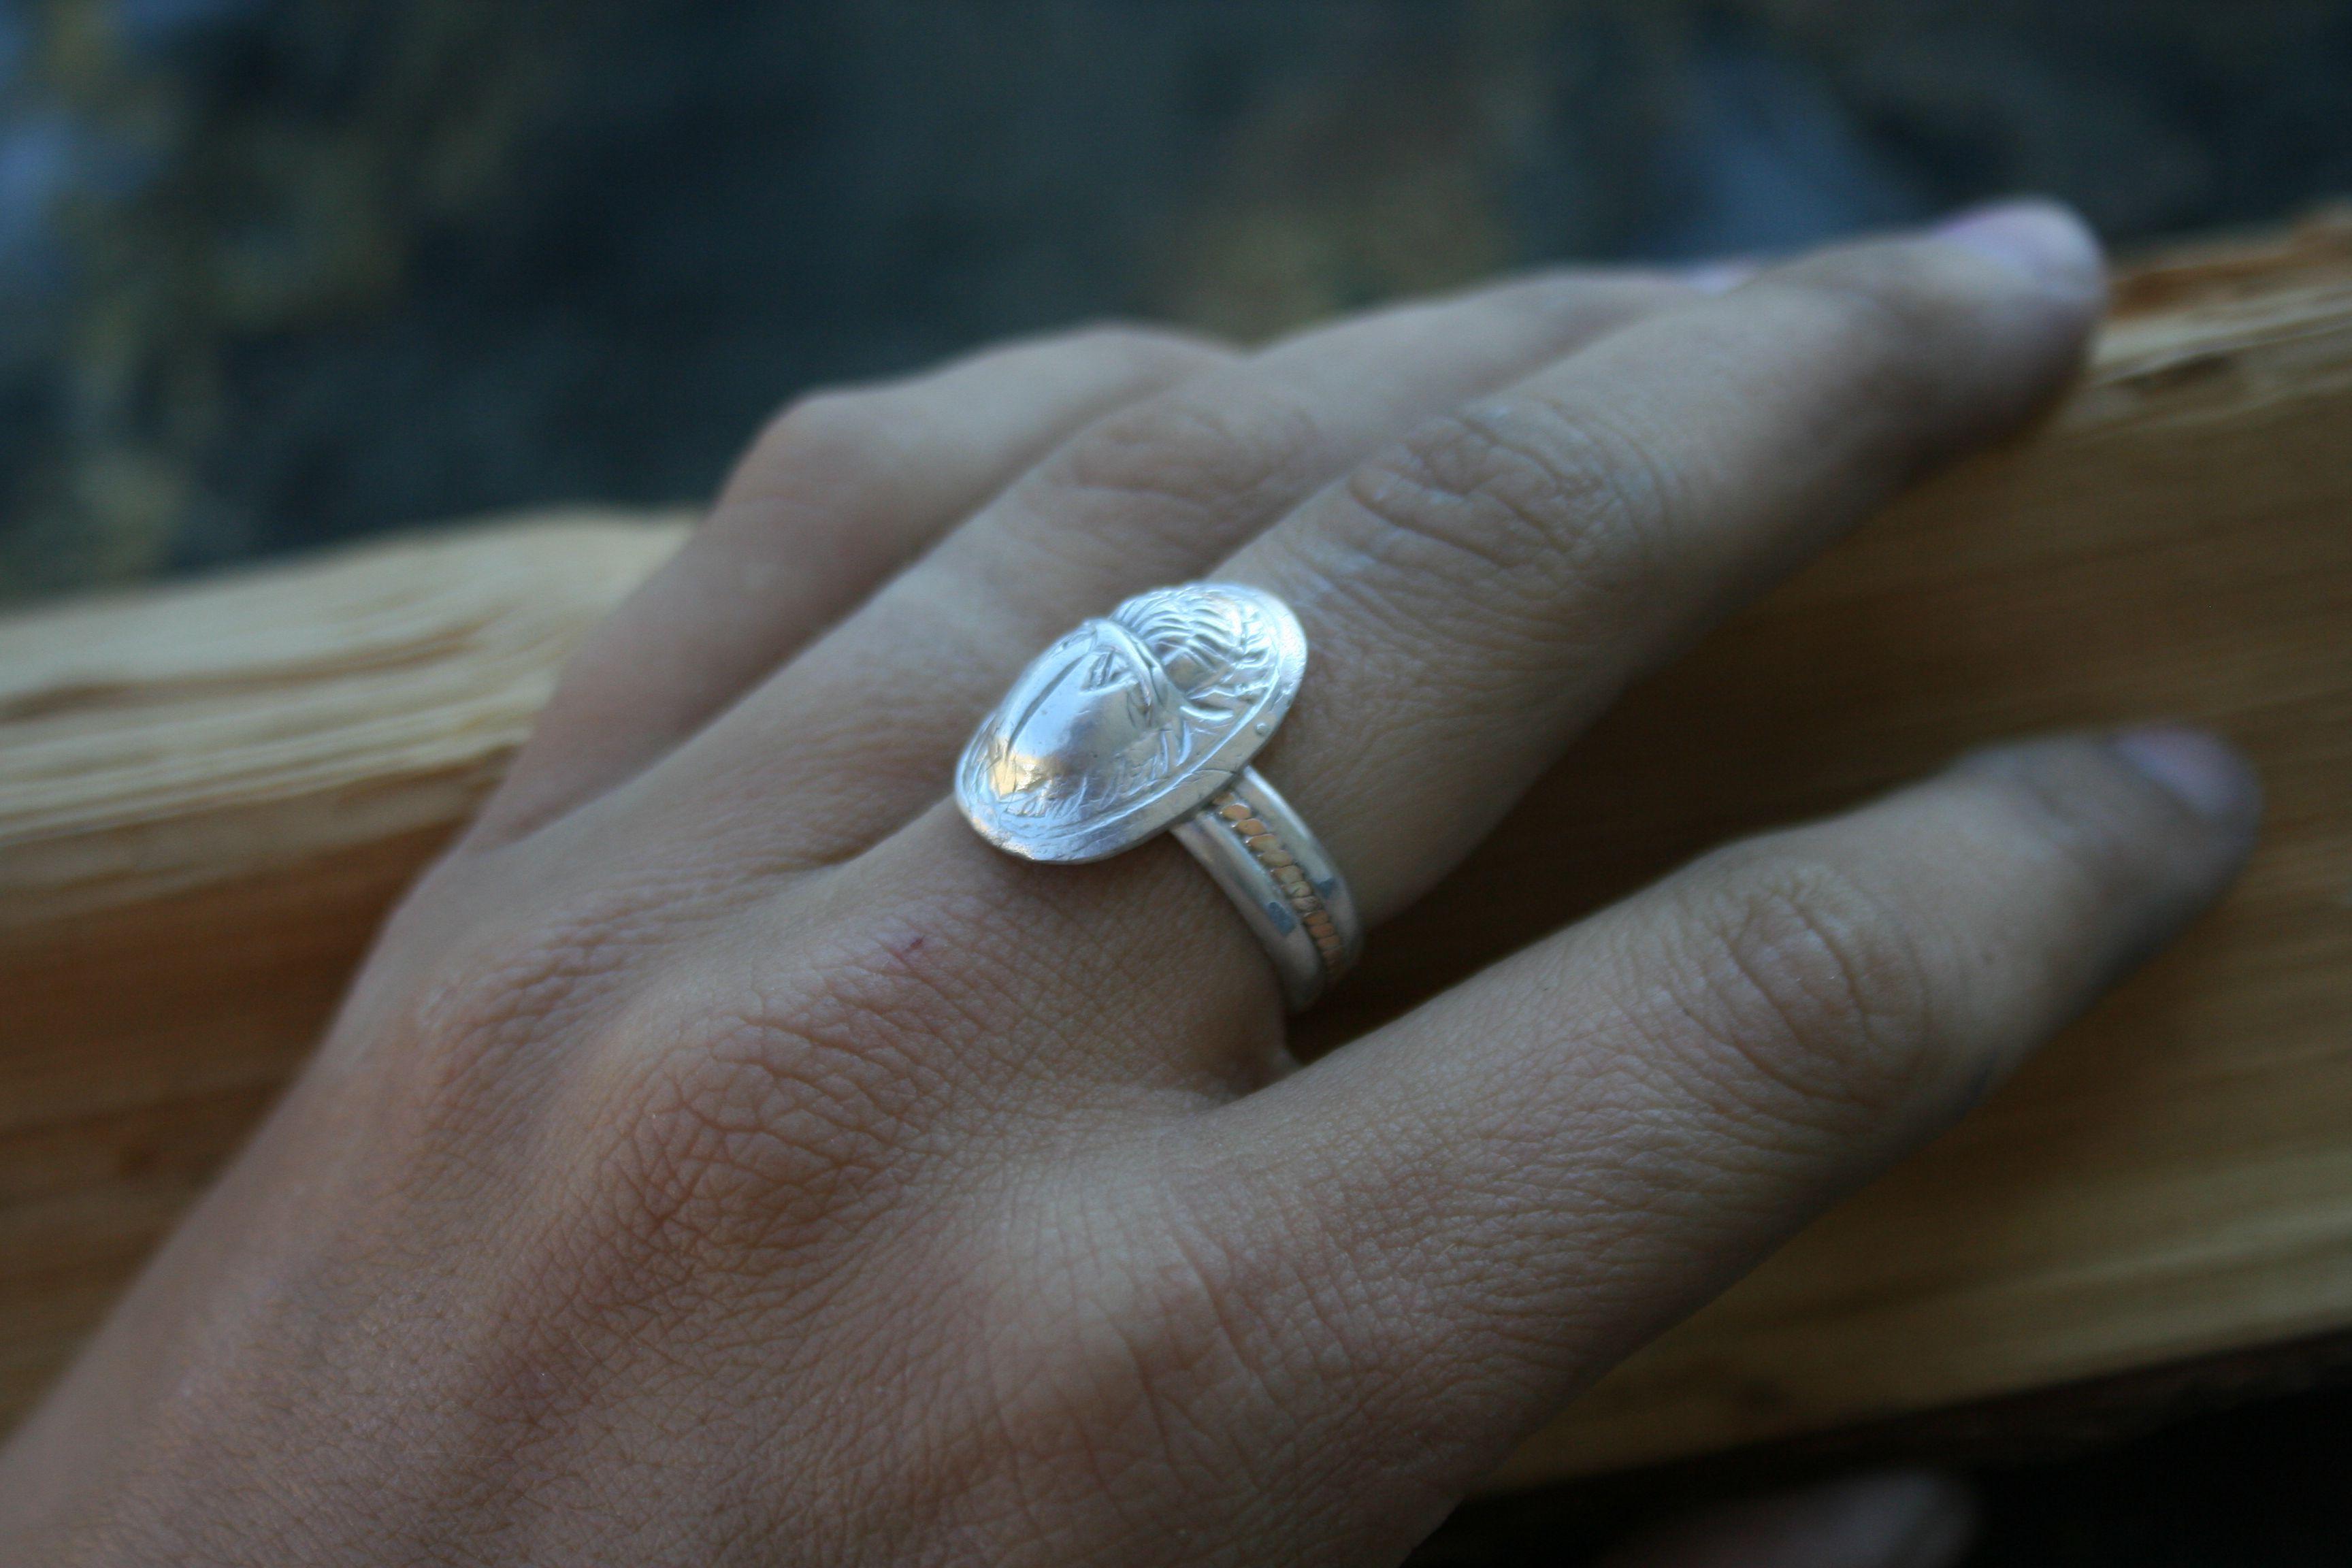 beetles boho silverrings rings size8ring 14kg egyptian egyptianring cleopatra scarabjewelry scarabs animaljewelry handmade gold silver bohochic